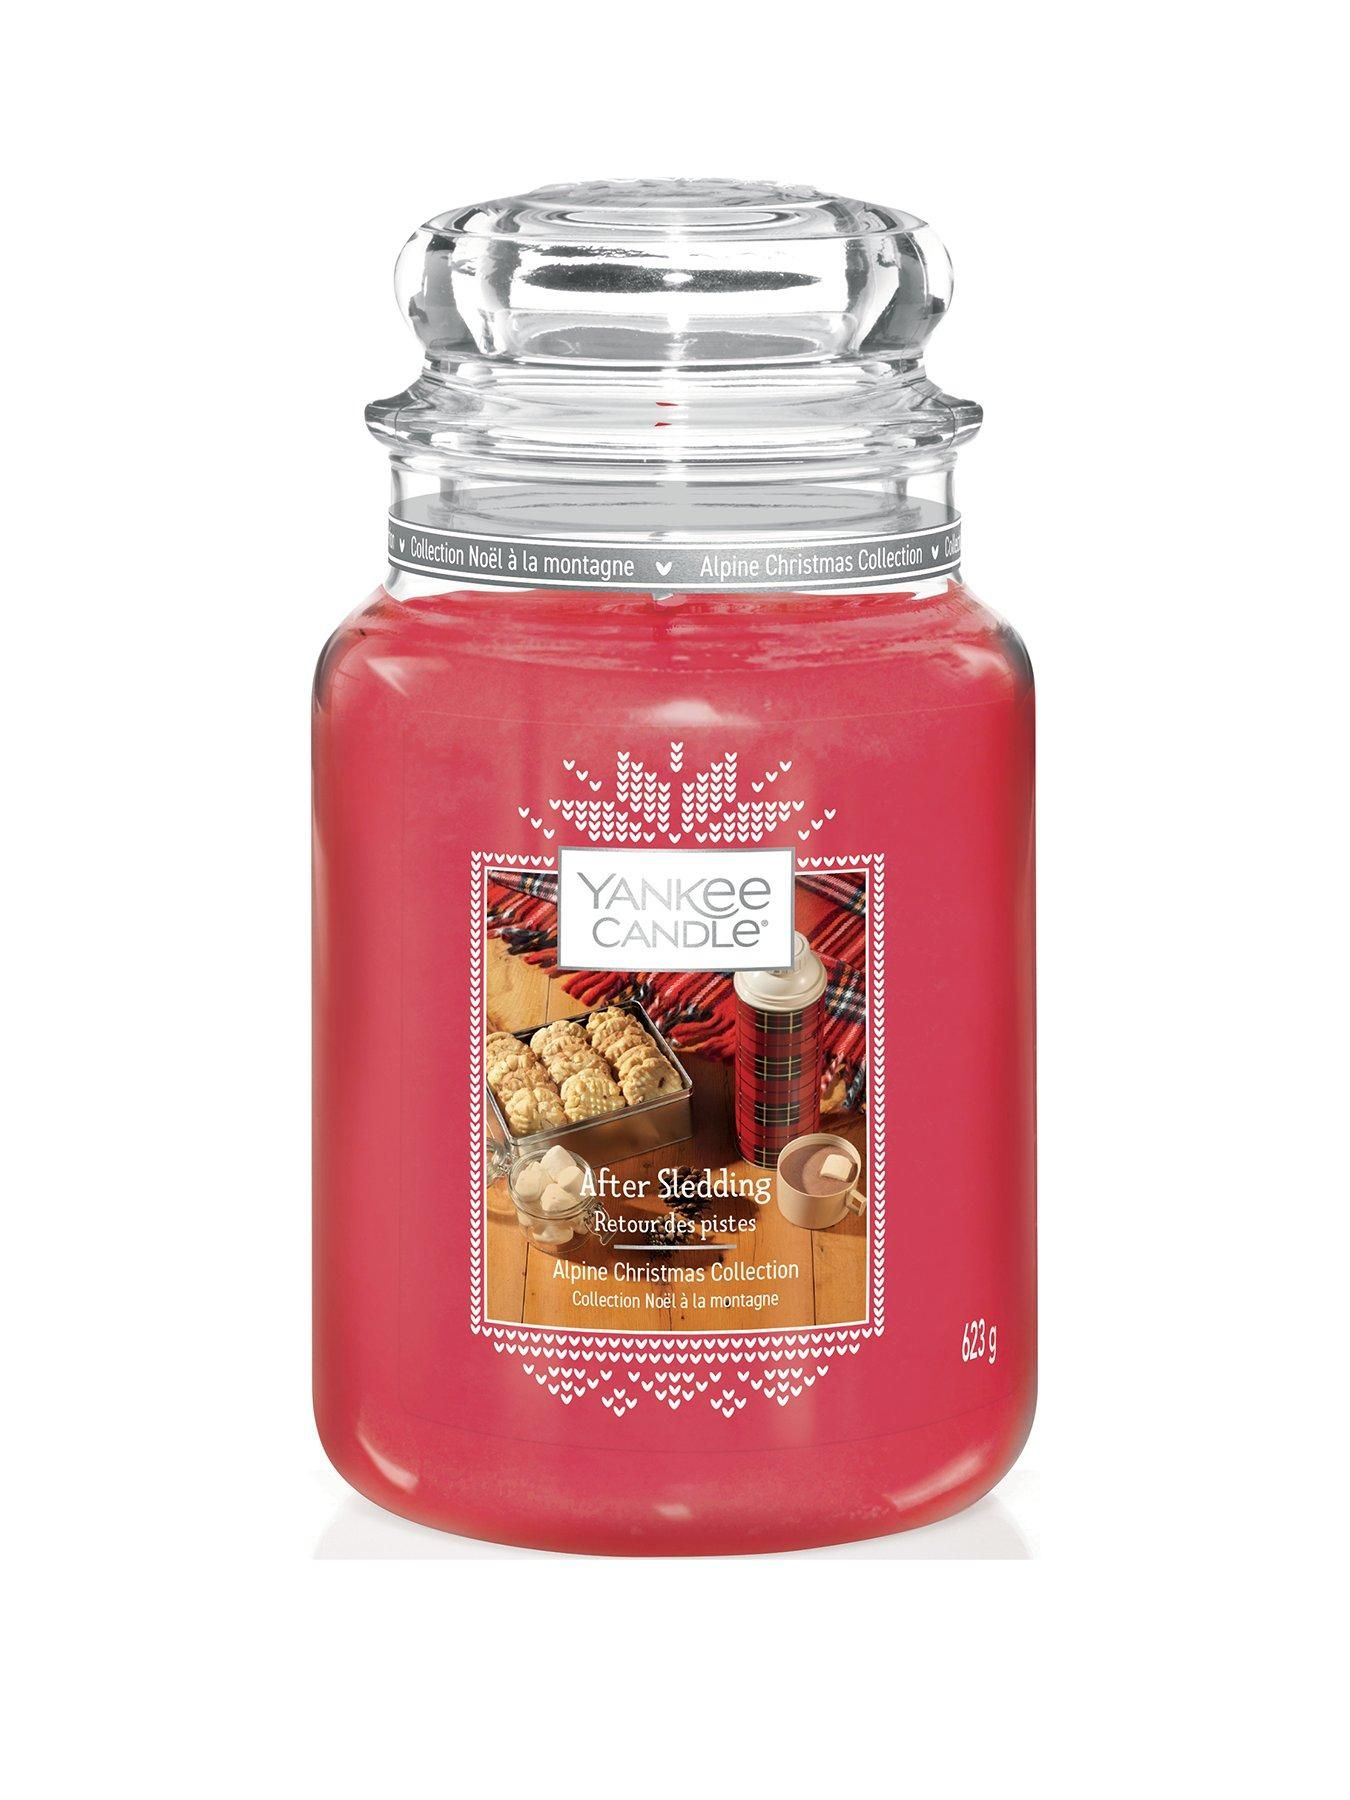 Yankee Candle Alpine Martini Small Jar Candle